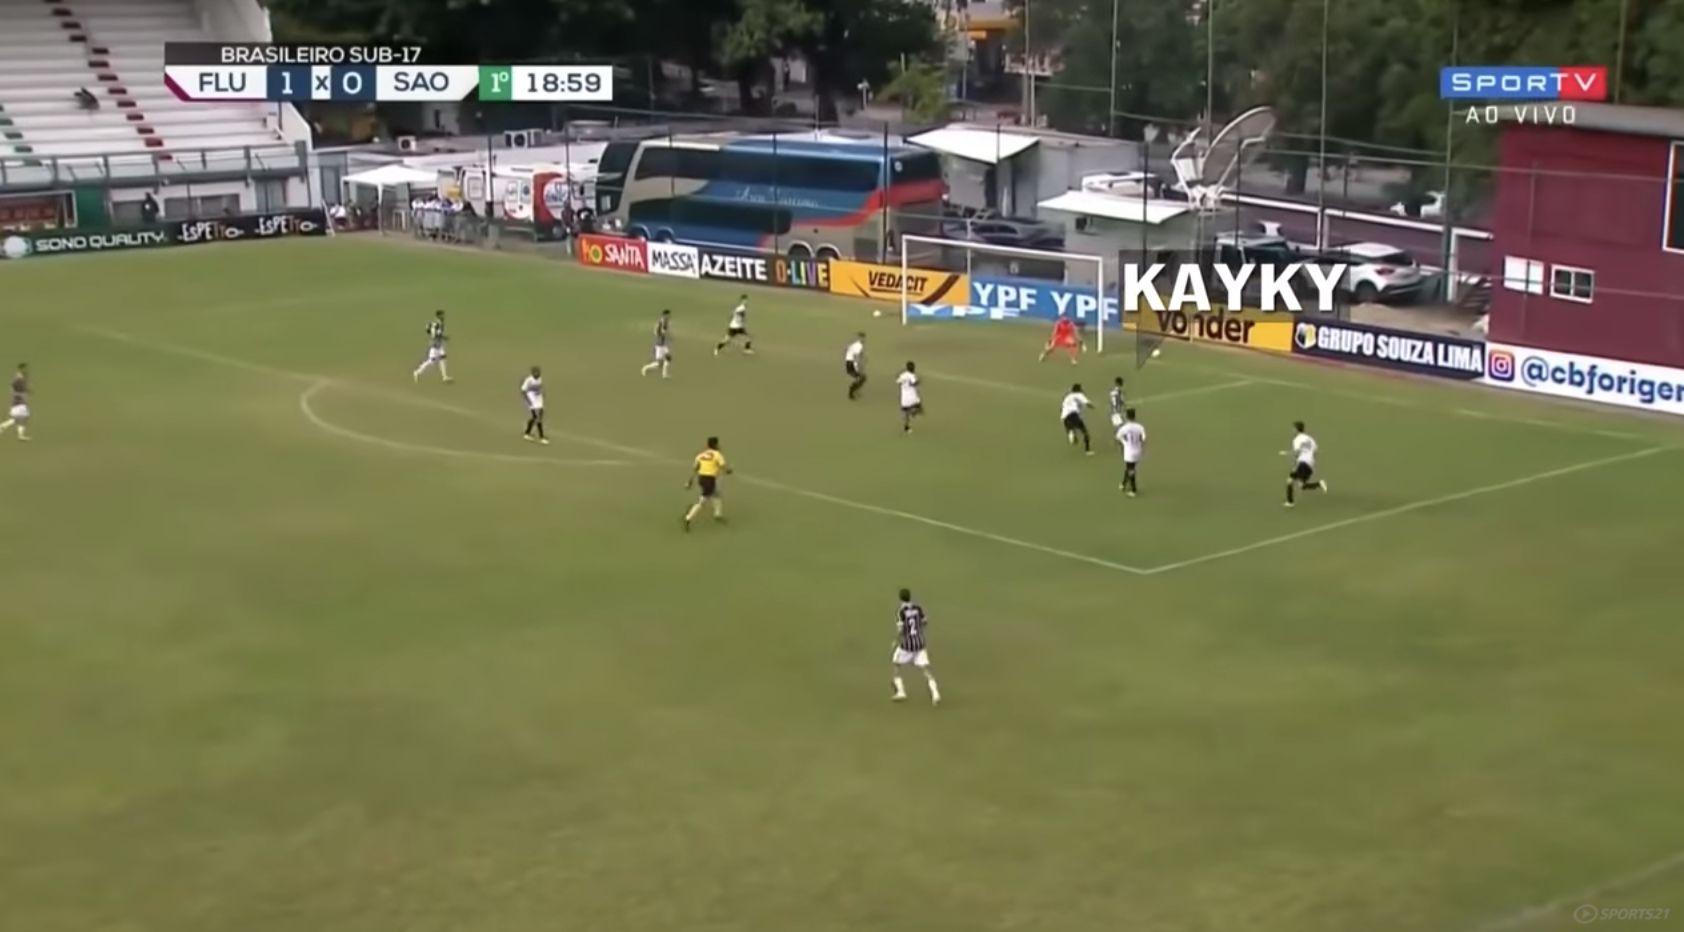 (Video) LFC target Kayky tearing it up in Brazil – Hotshot has a bit of Mo Salah about him